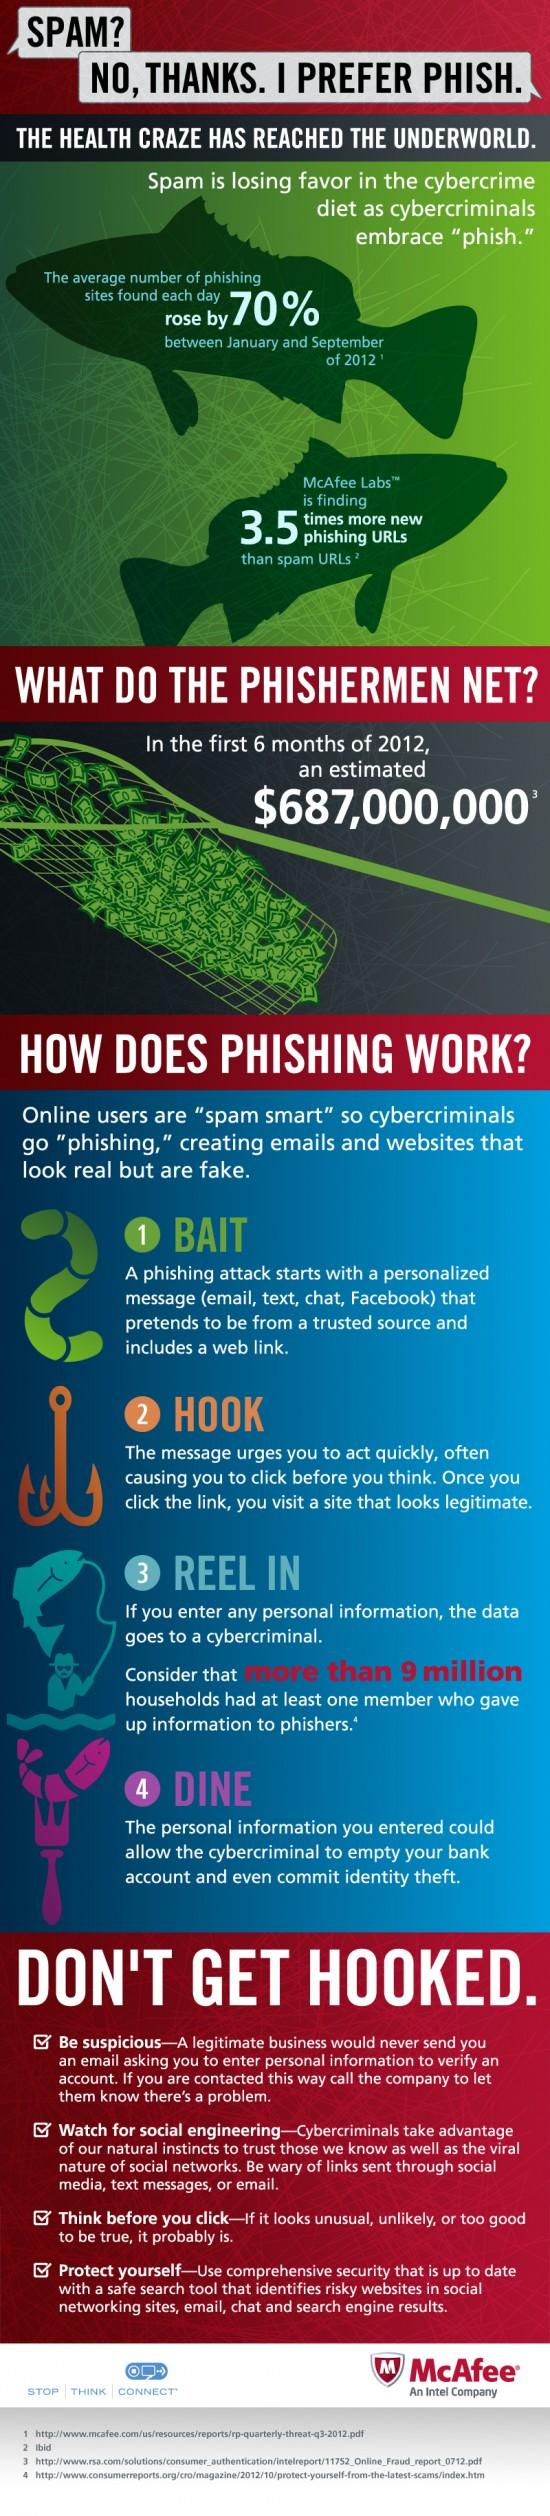 mcafee phishing infographic